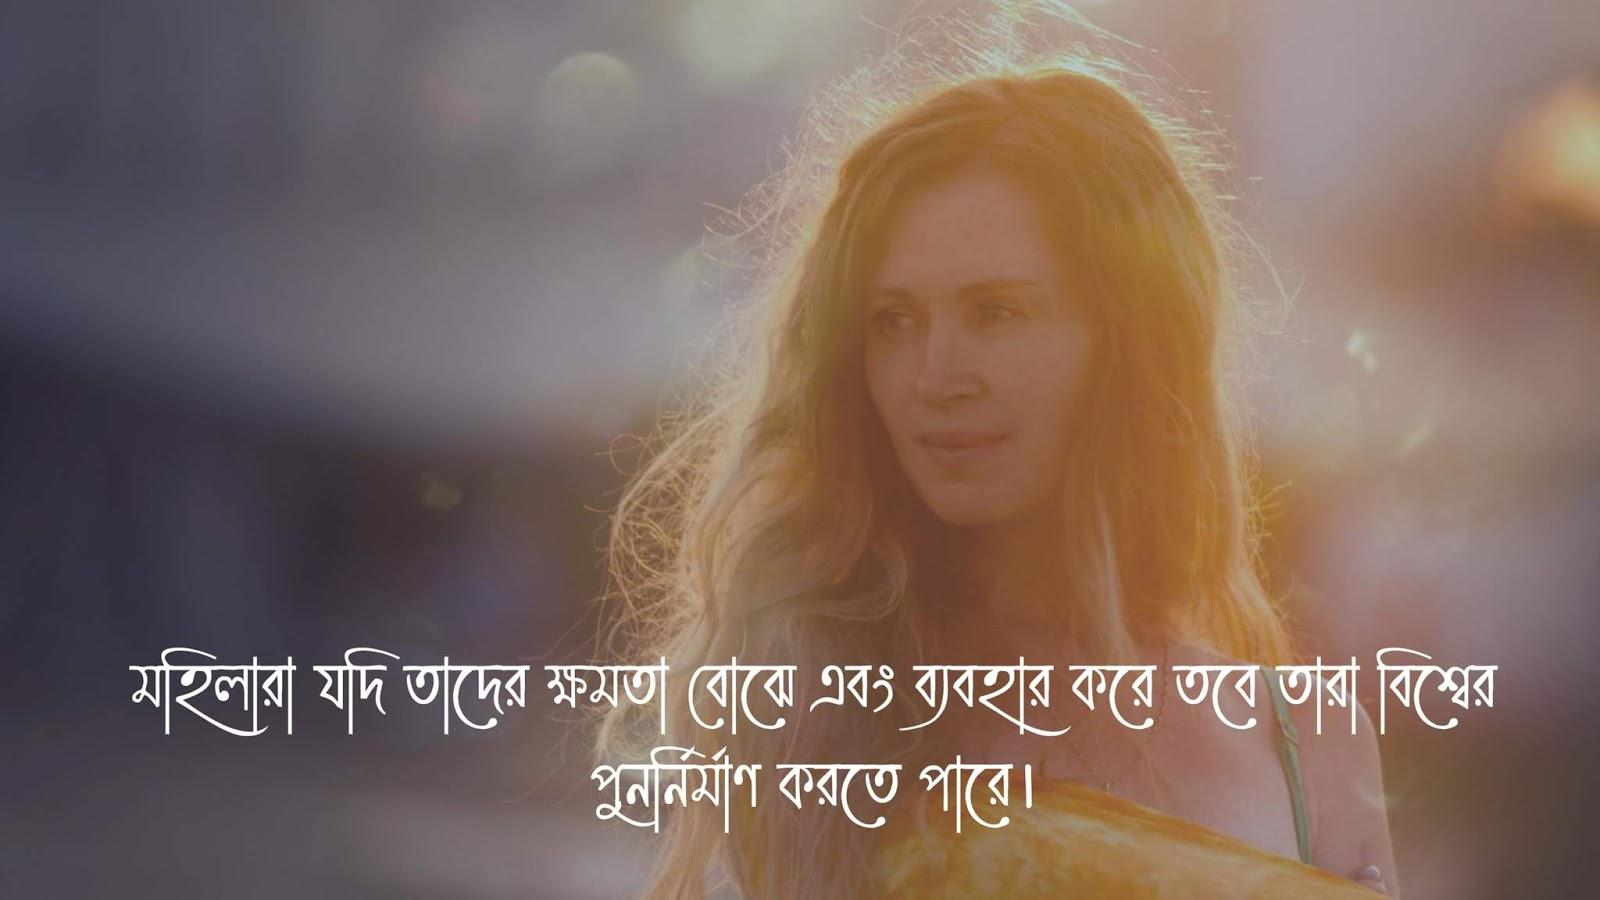 Bengali Girl Quotes